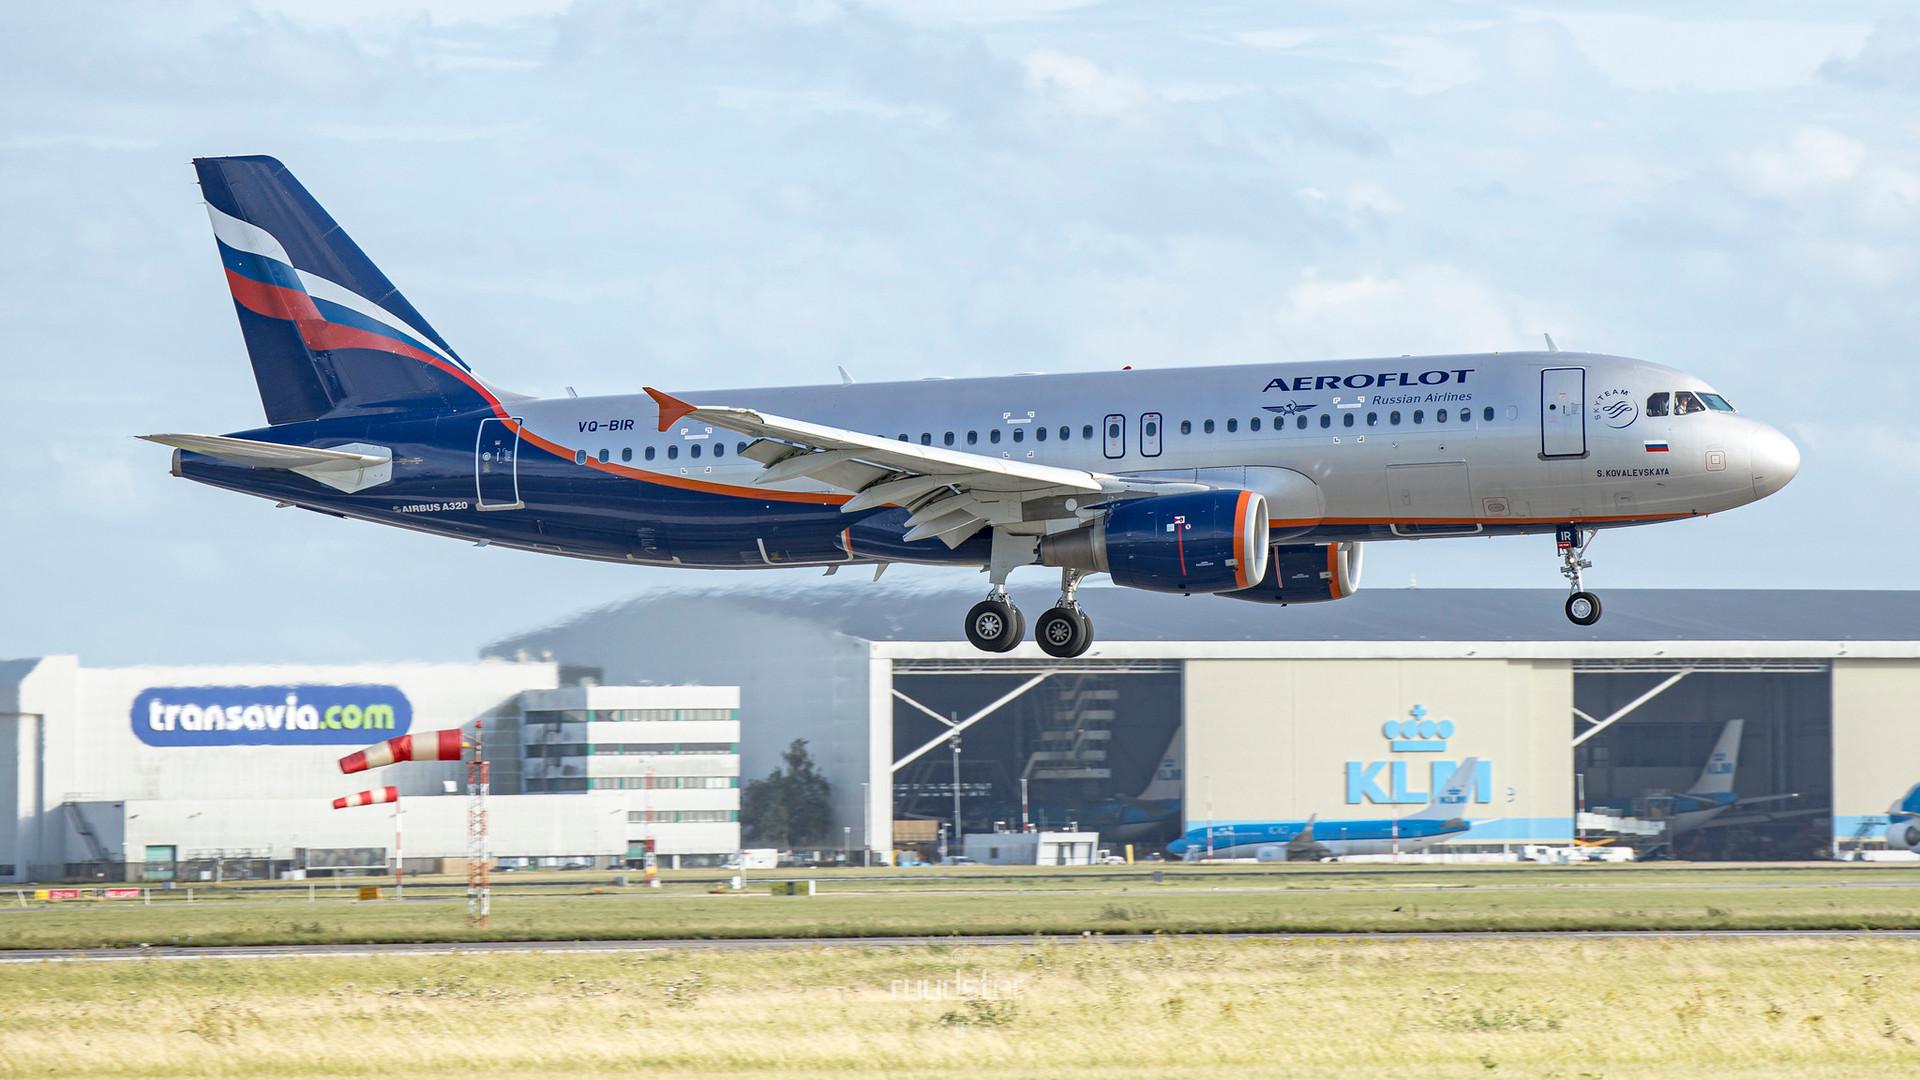 VQ-BIR   Build: 2011 - Airbus A320-214